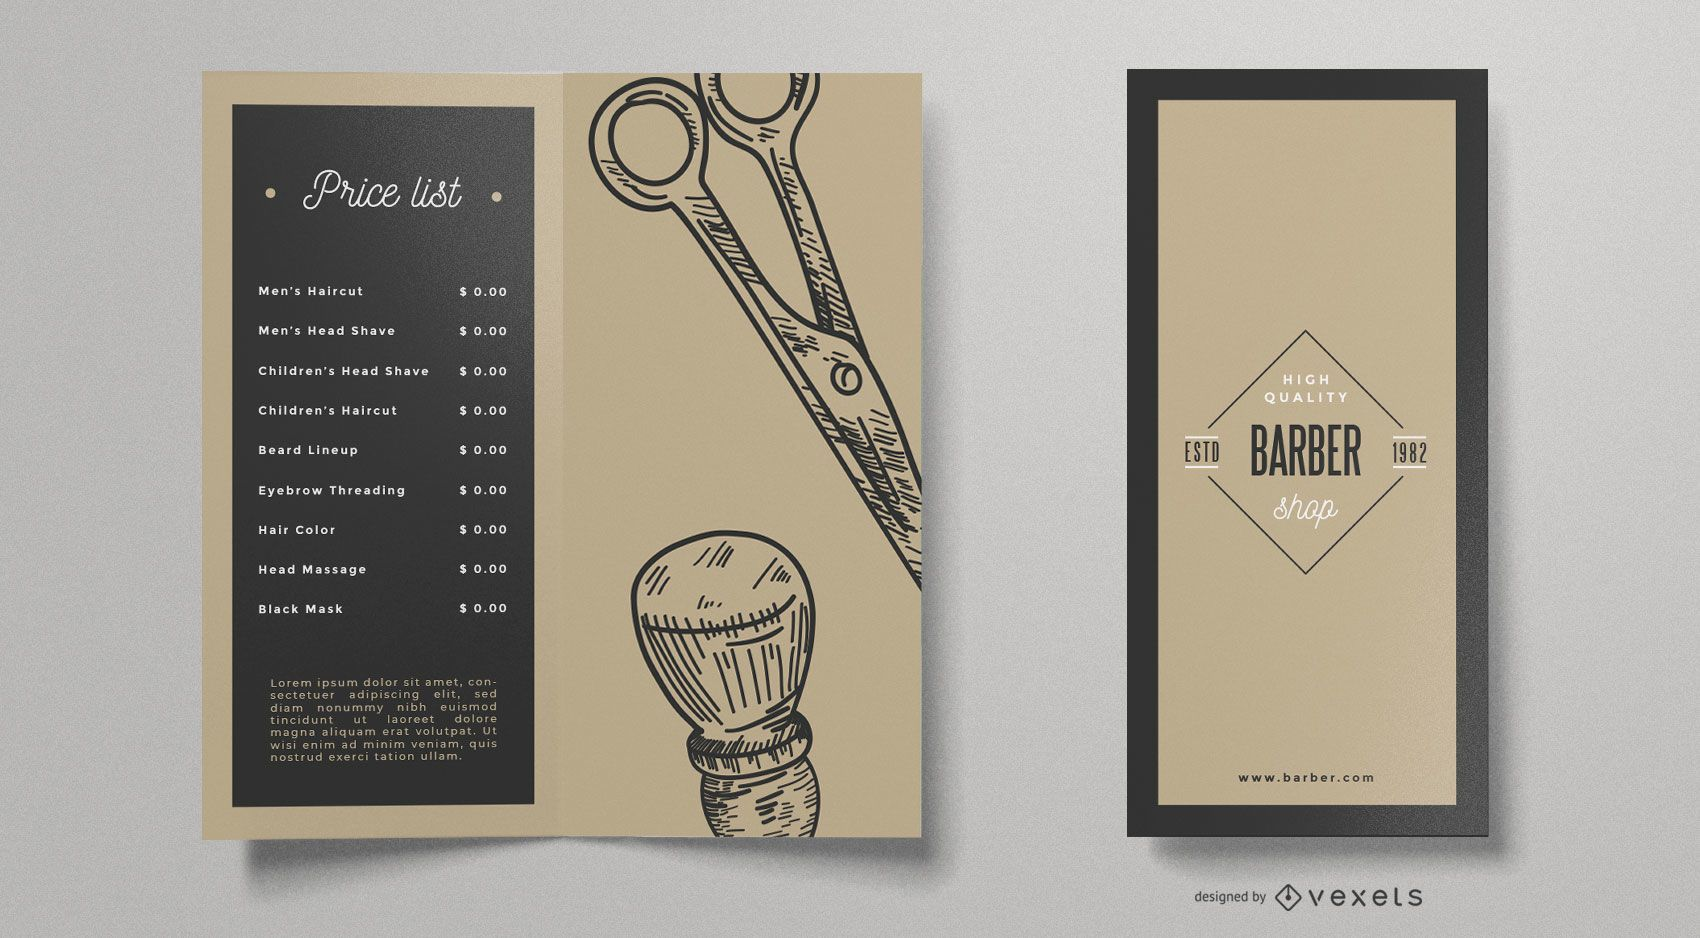 Modelo de folheto vintage de barbearia